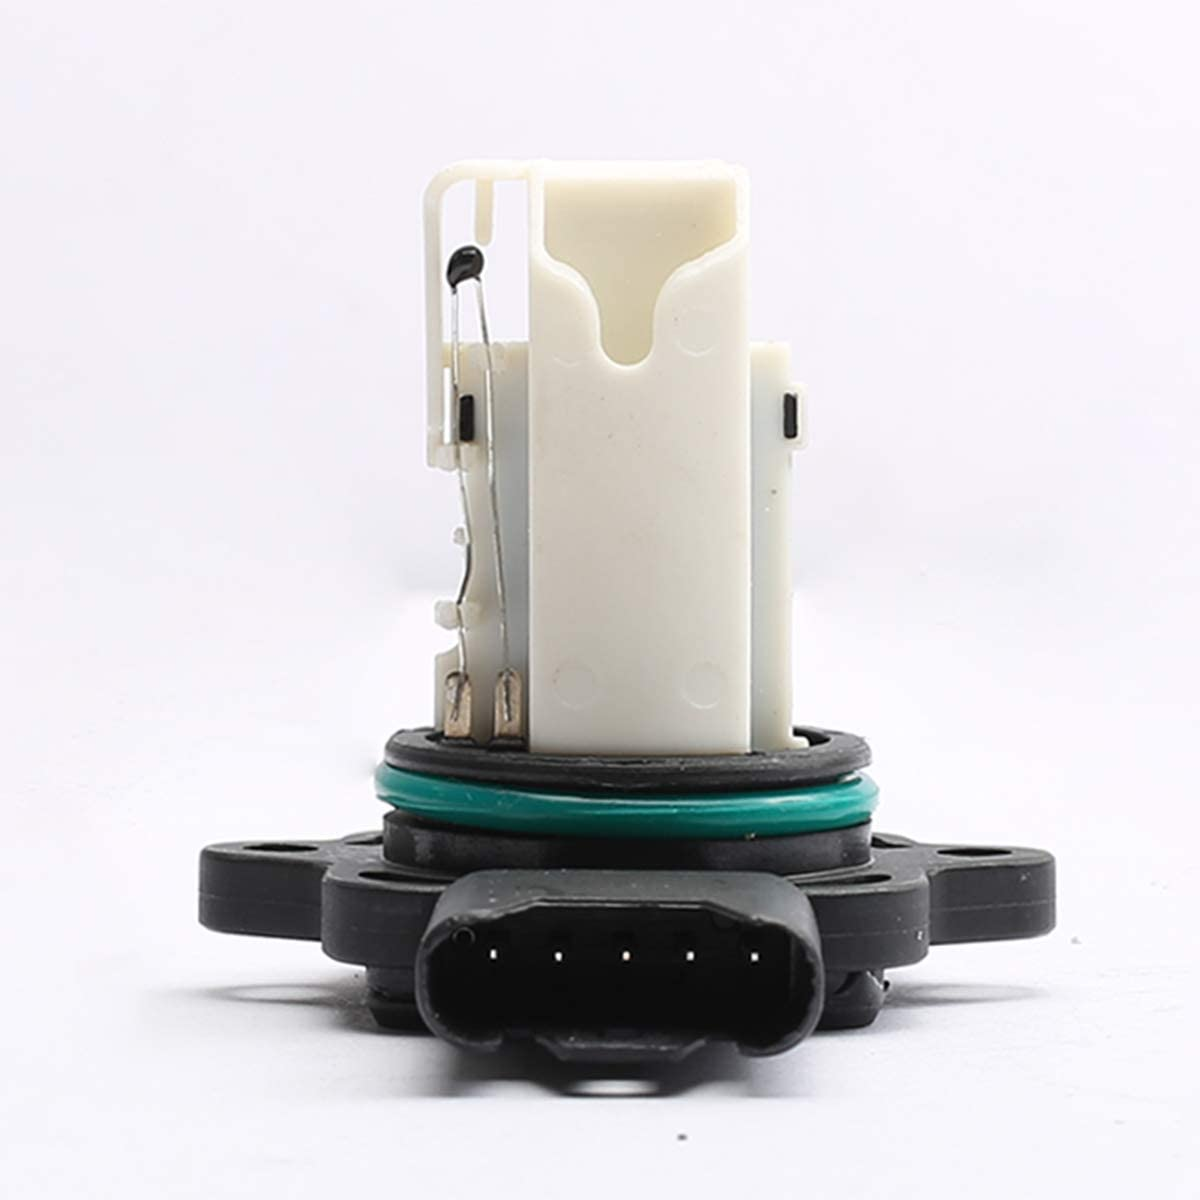 5WK97508Z Mass Air Flow Sensor Meter For BMW 128i 328i 528i X3 X5 Z4 13627551638